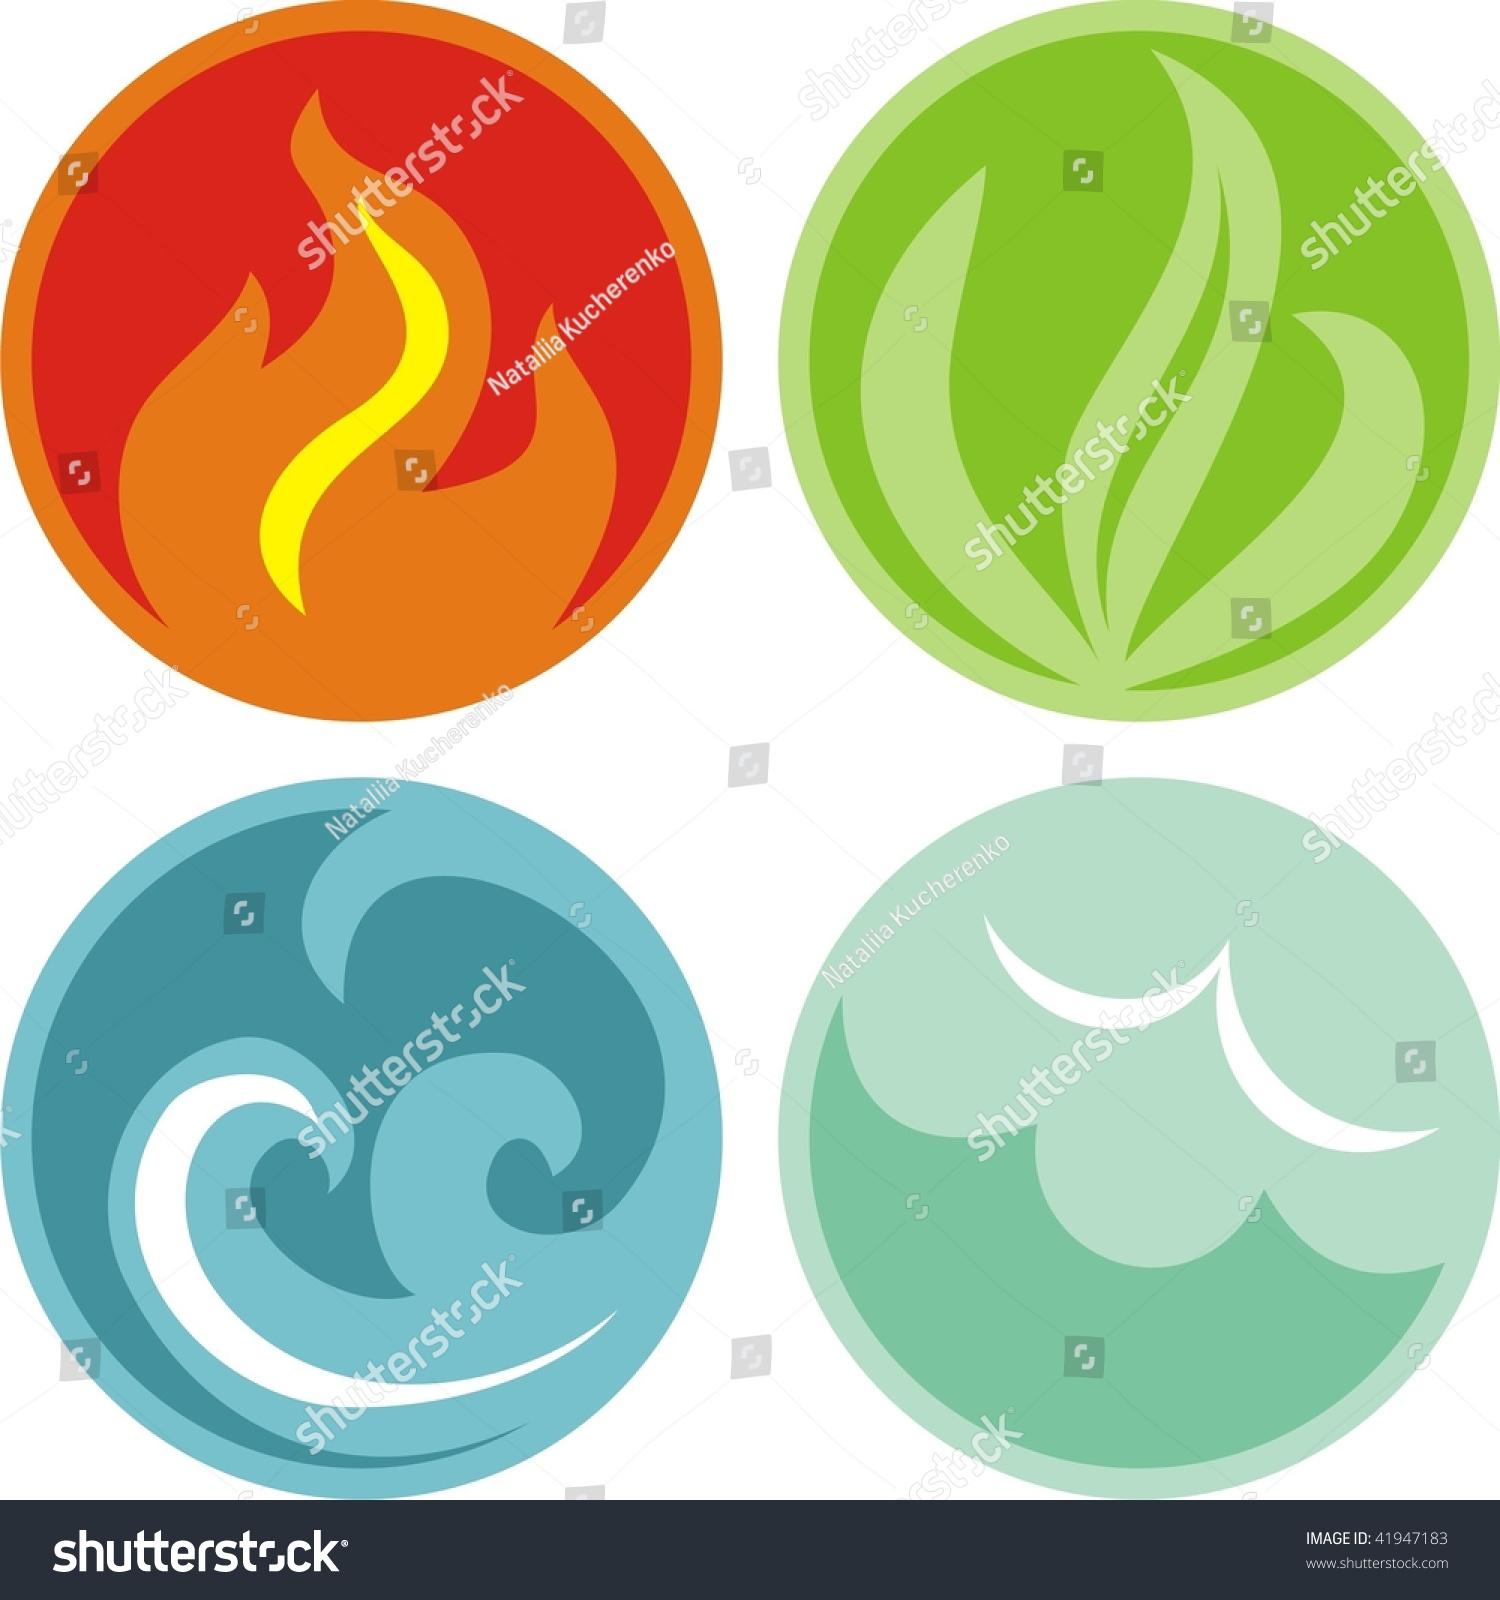 Natural Elements Stock Vector Illustration 41947183